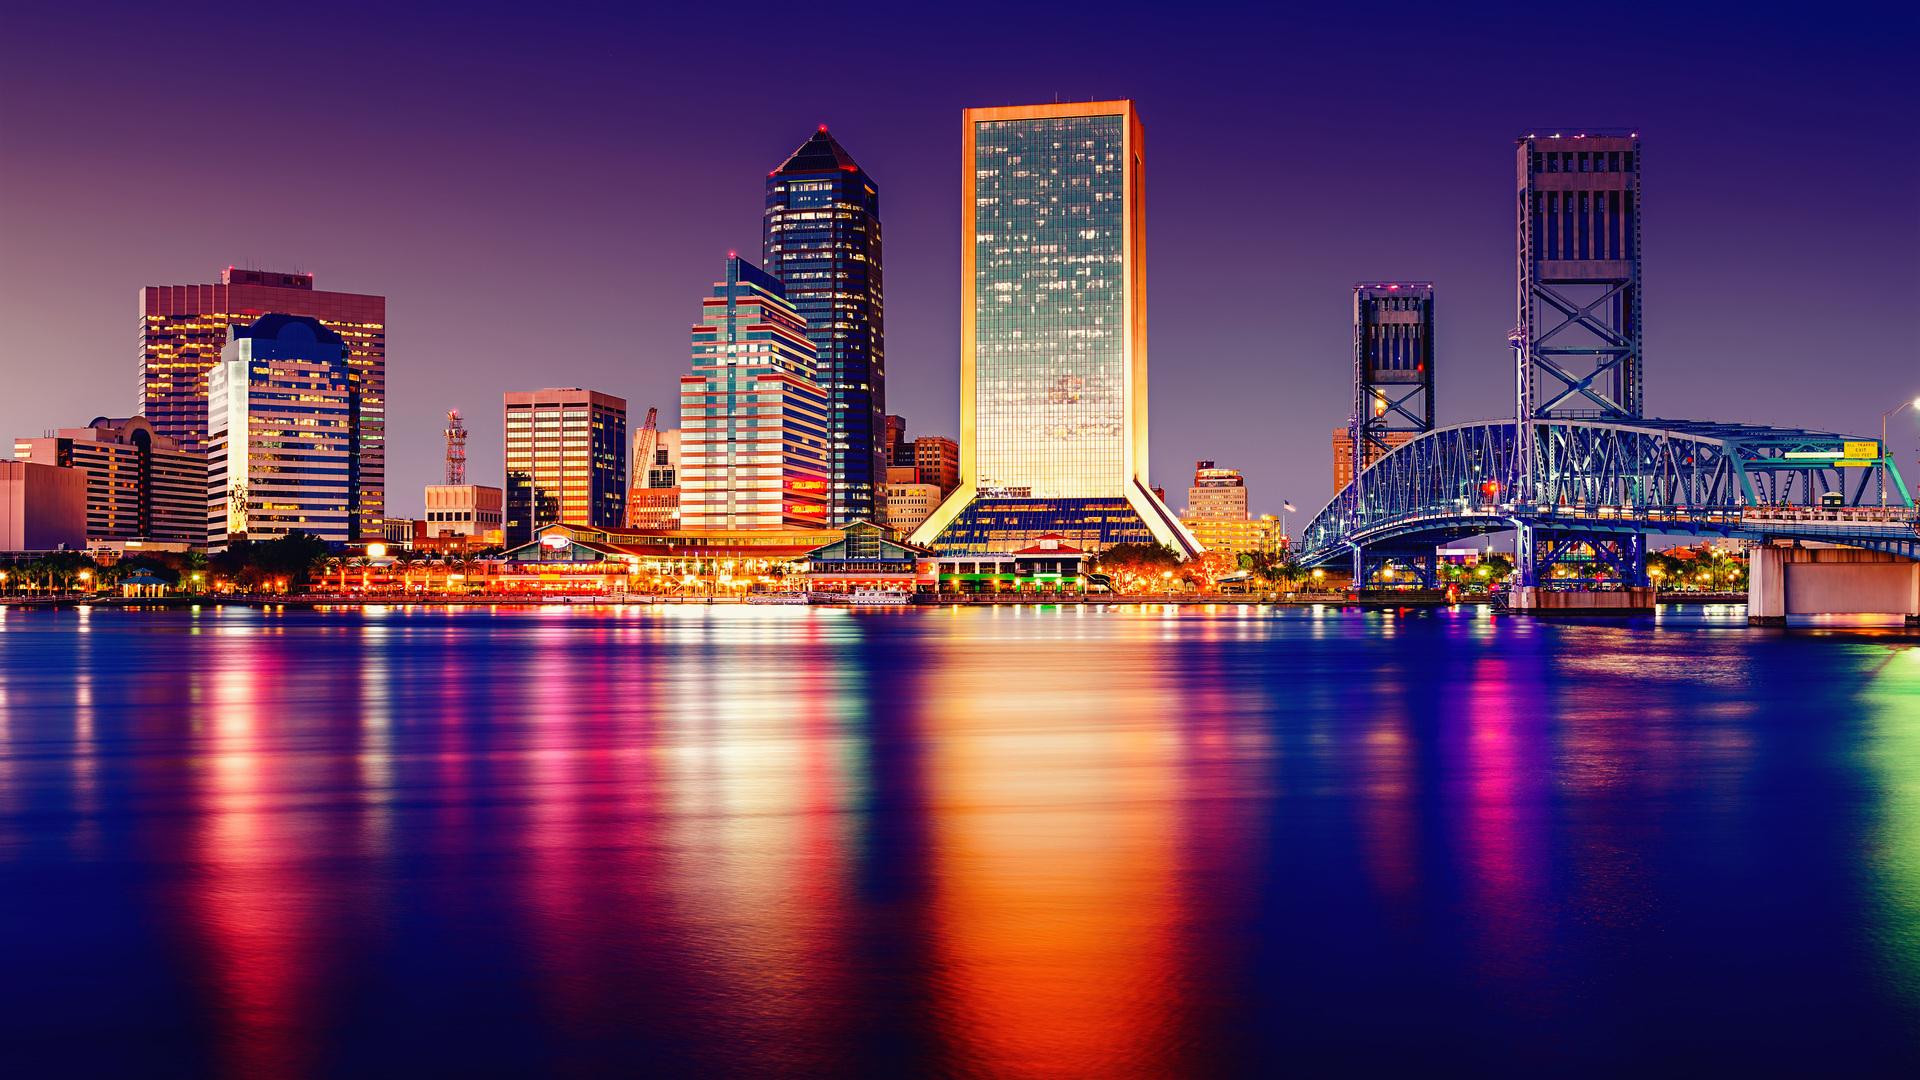 1920x1080 Florida Cityscape 4k Laptop Full HD 1080P HD 4k ...